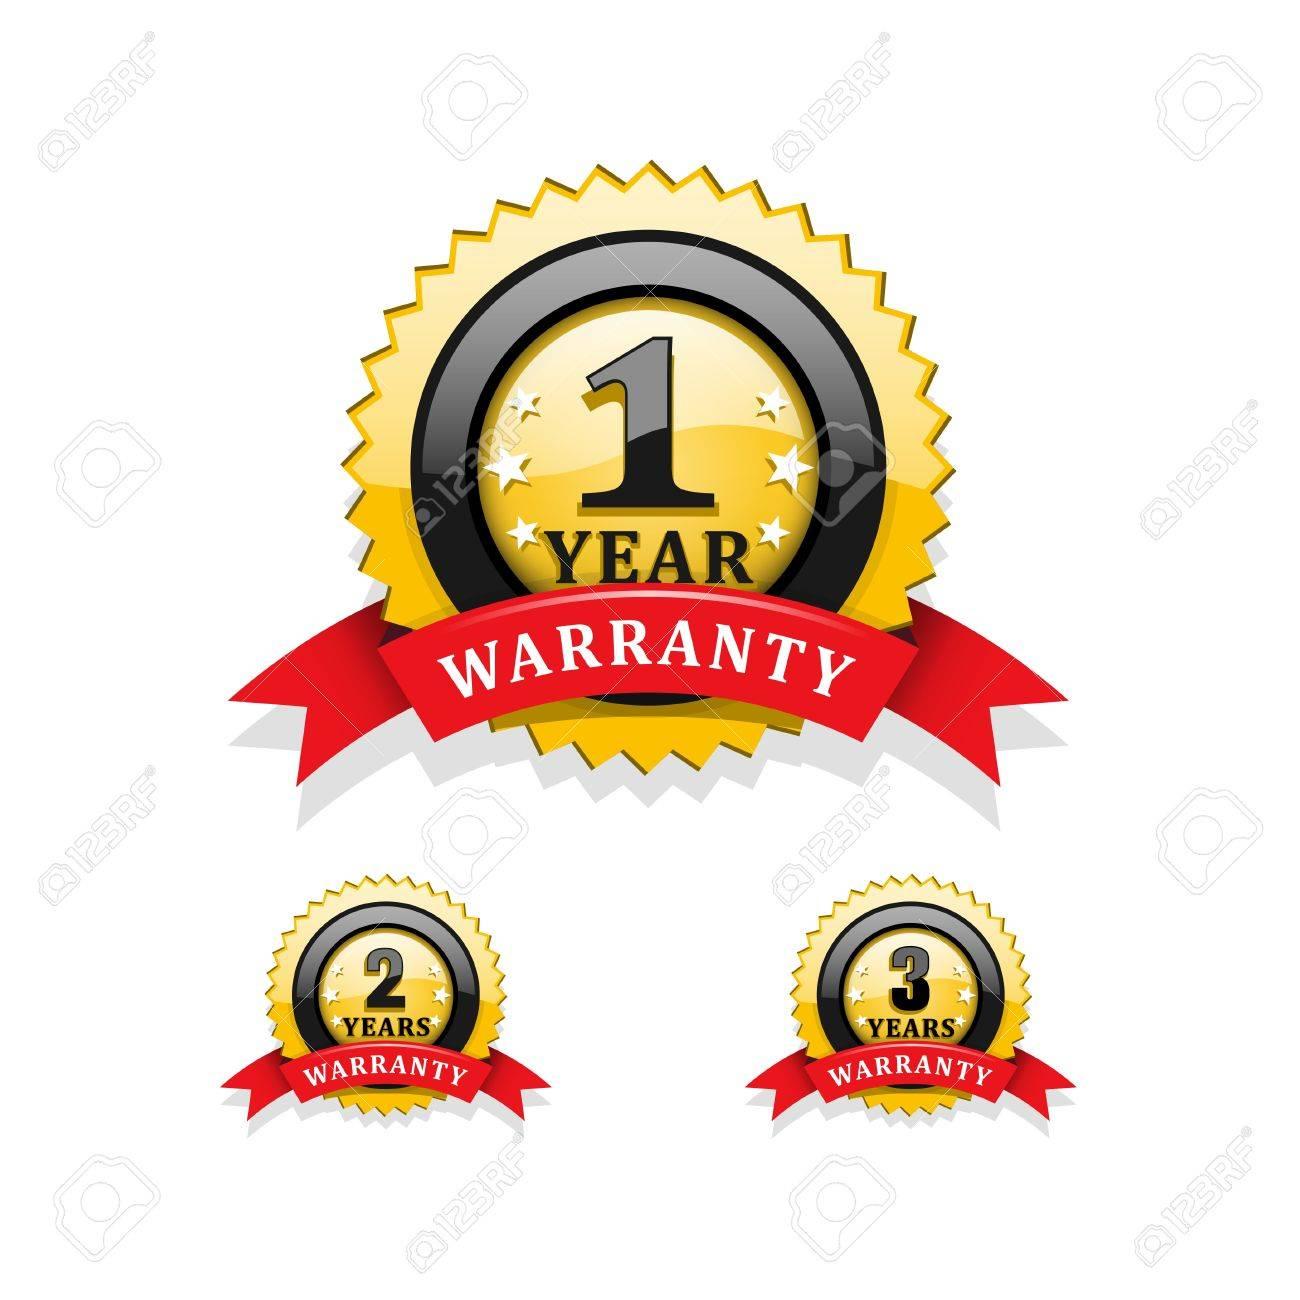 Warranty emblems vector Stock Vector - 22015606